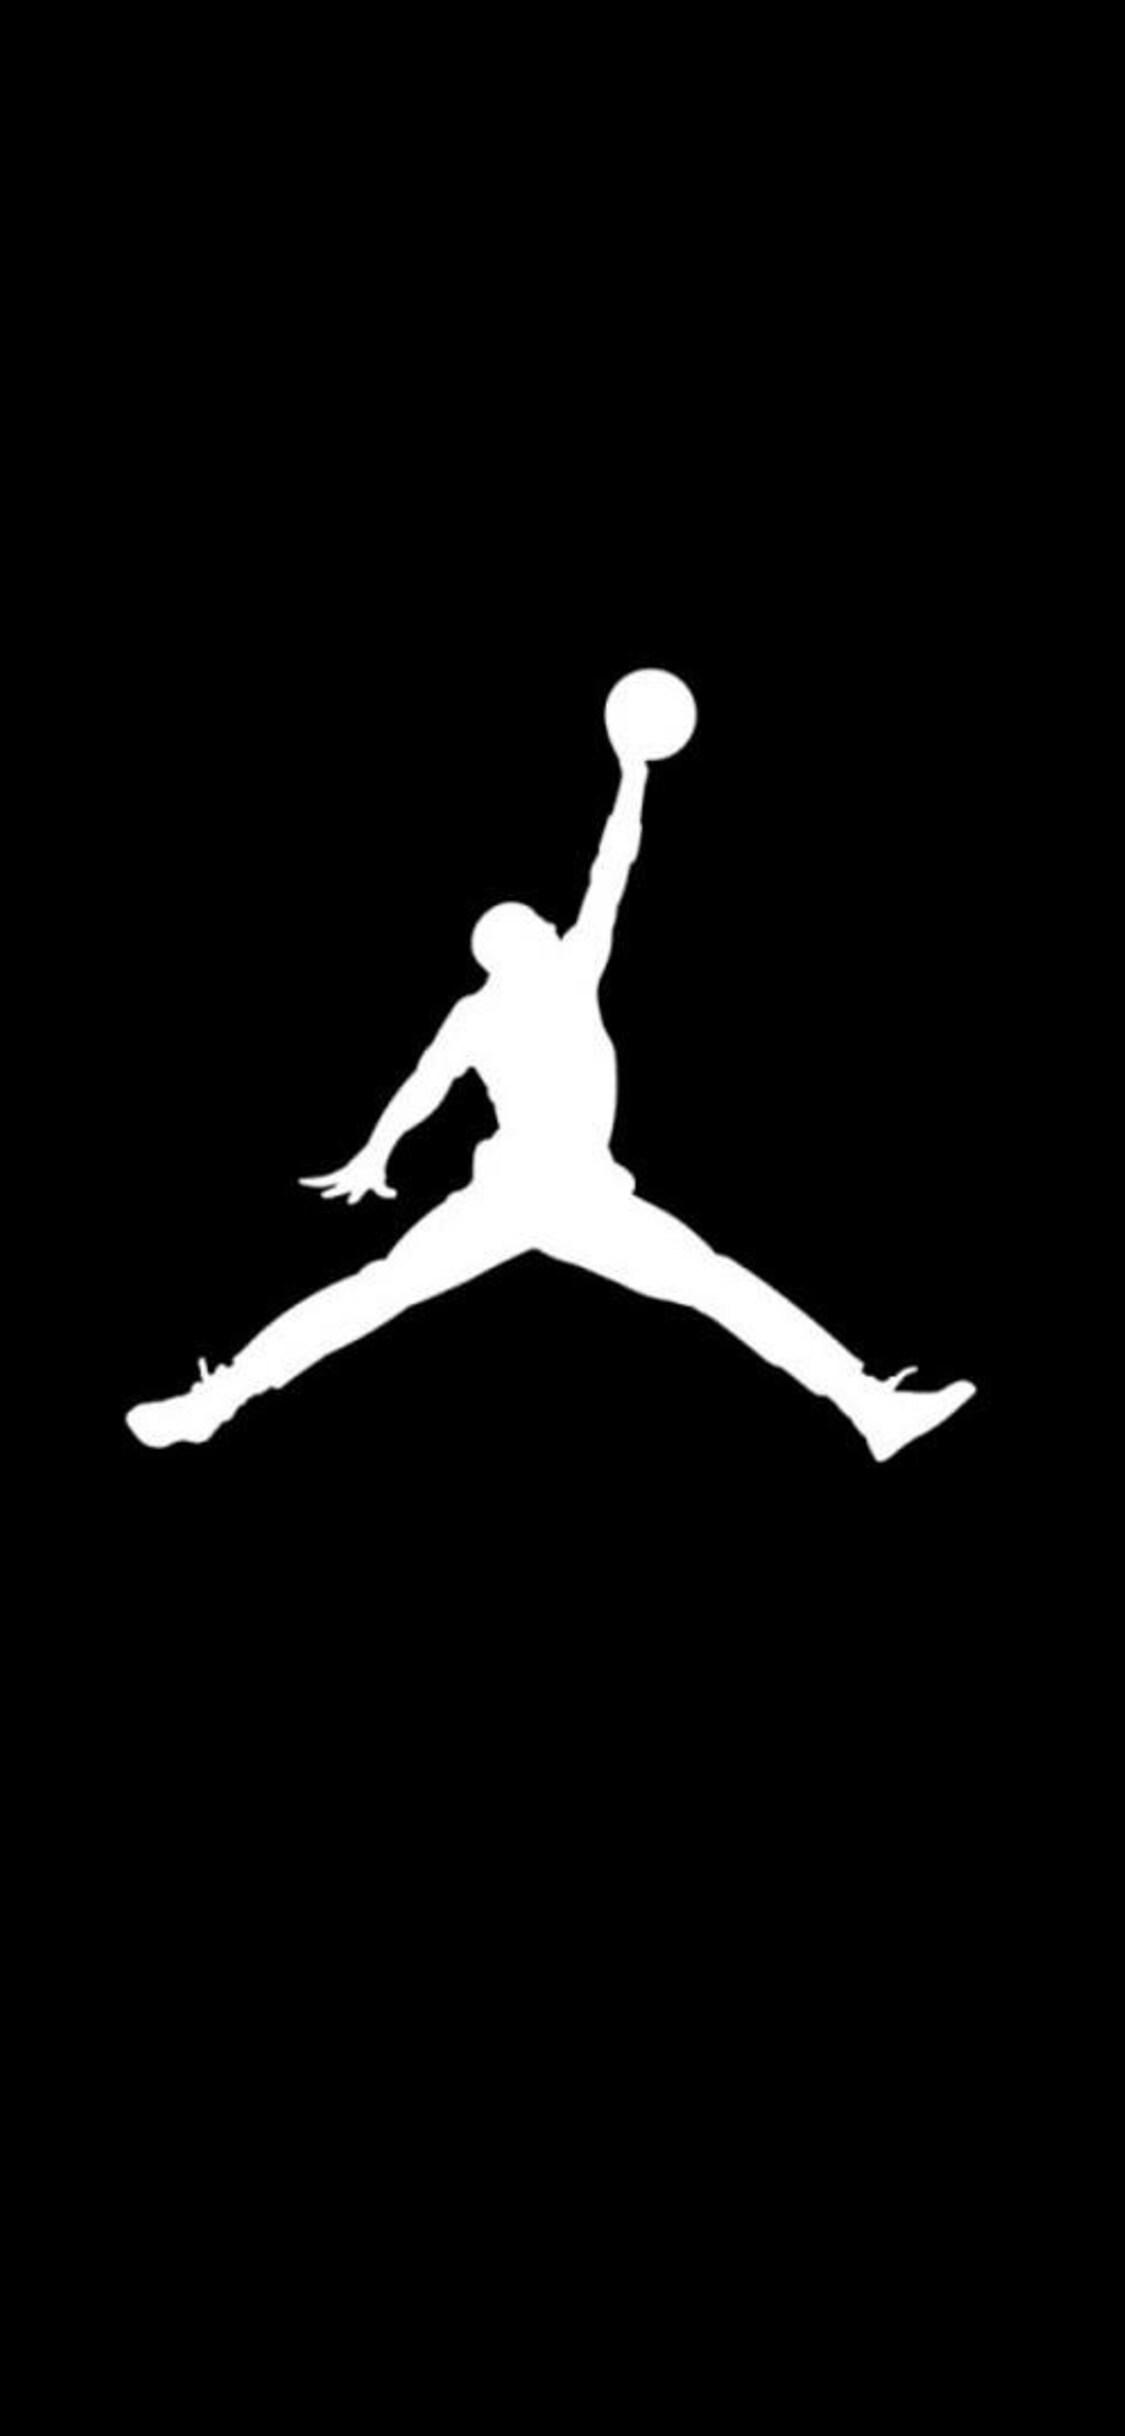 1125x2436 Michael Jordan Iphone Xs Iphone 10 Iphone X Hd 4k